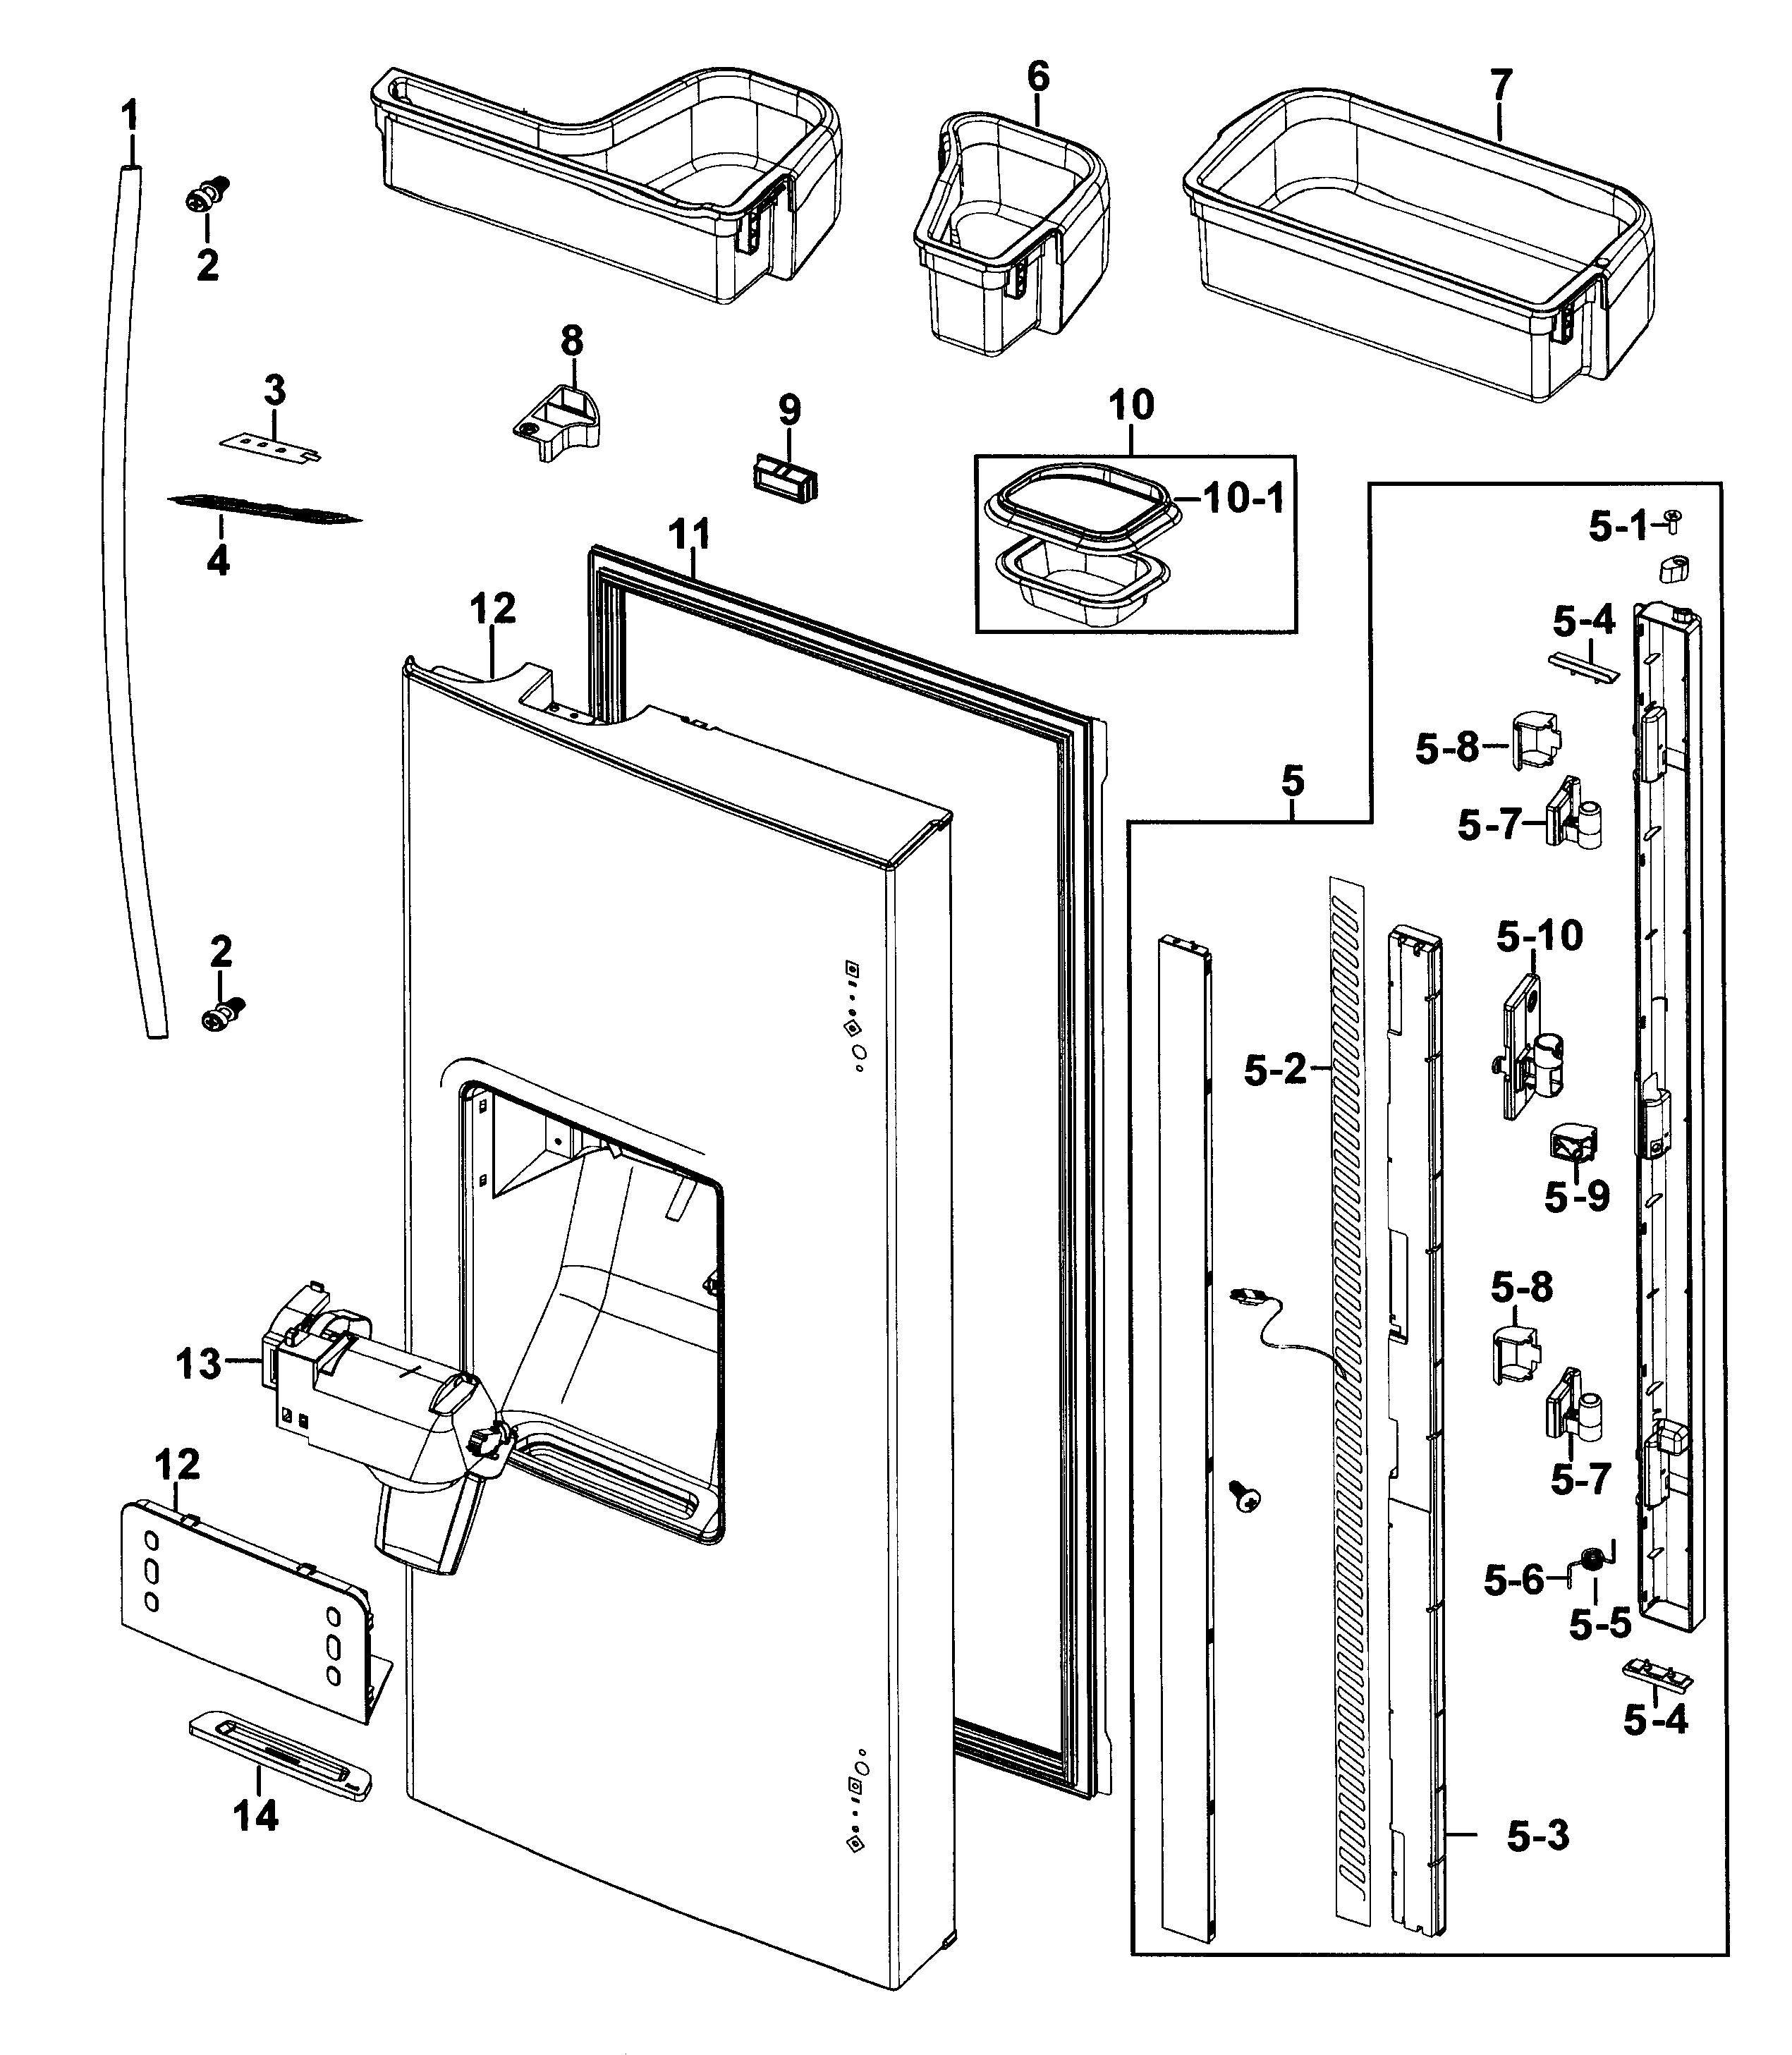 Refrigerator Model Et18dkxan10 Wiring Diagram